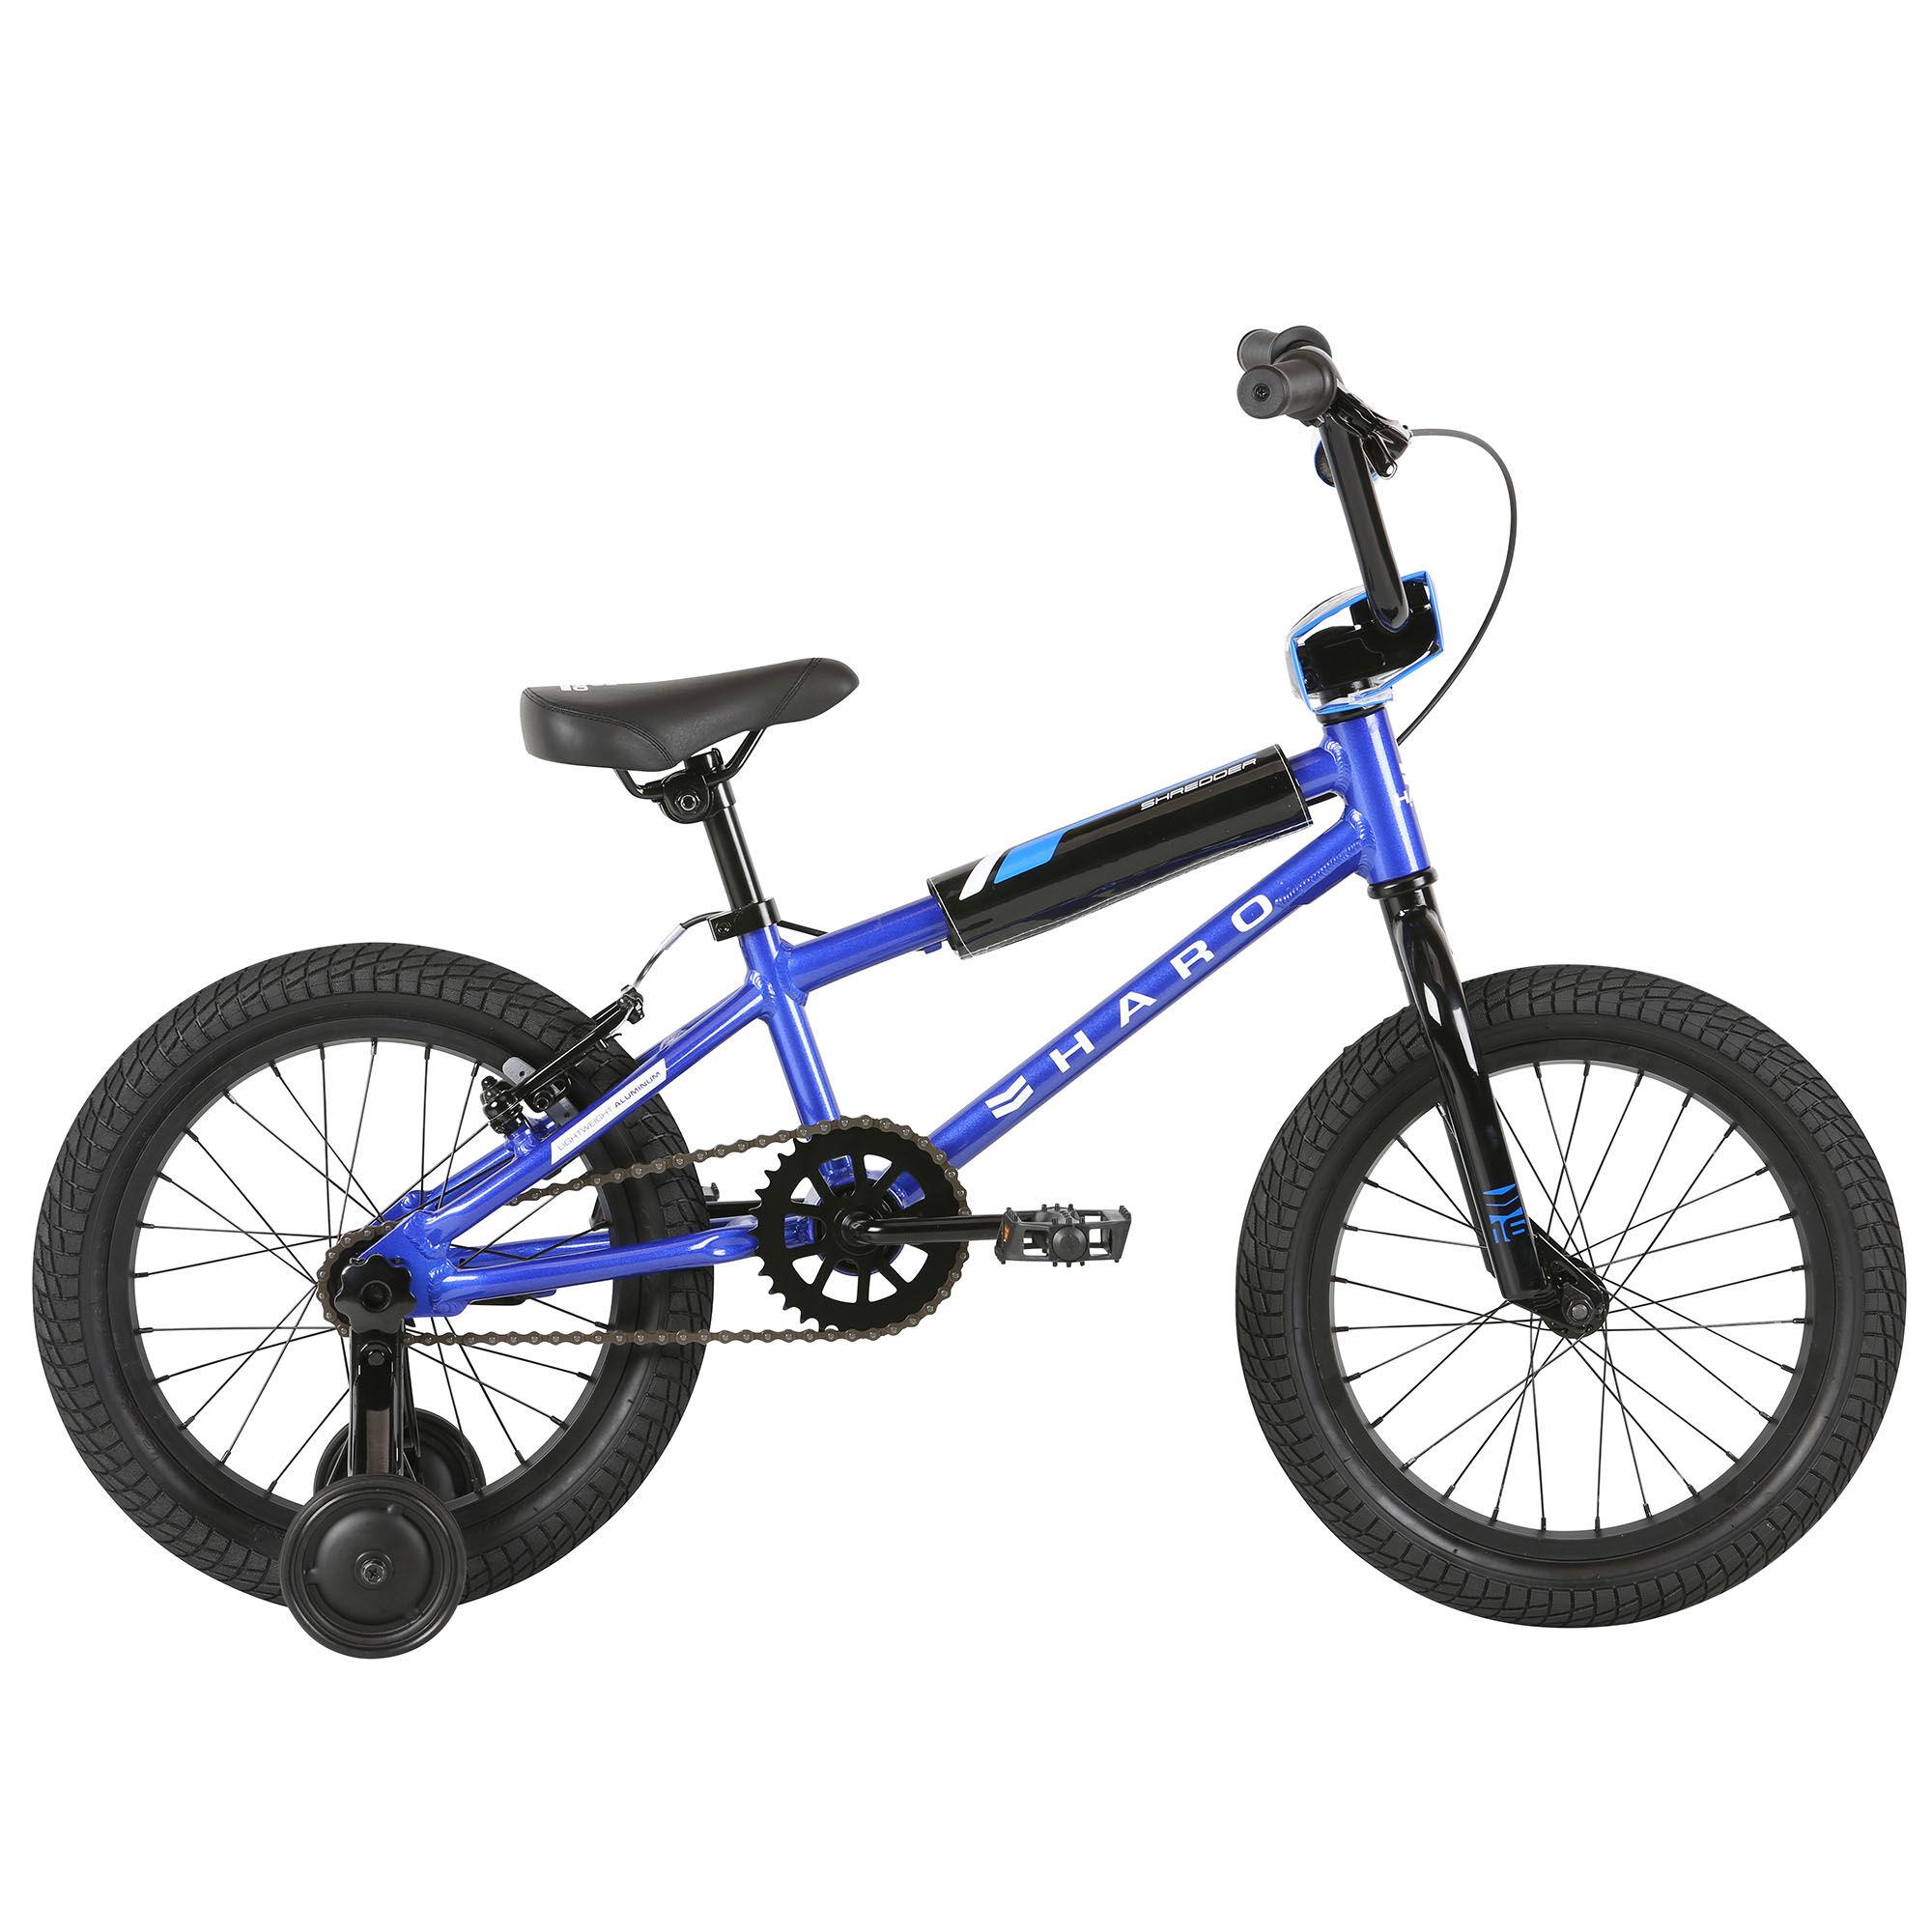 Haro Boy's Shredder 16 Sidewalk Bike '21  - Matte Black - Size: 16